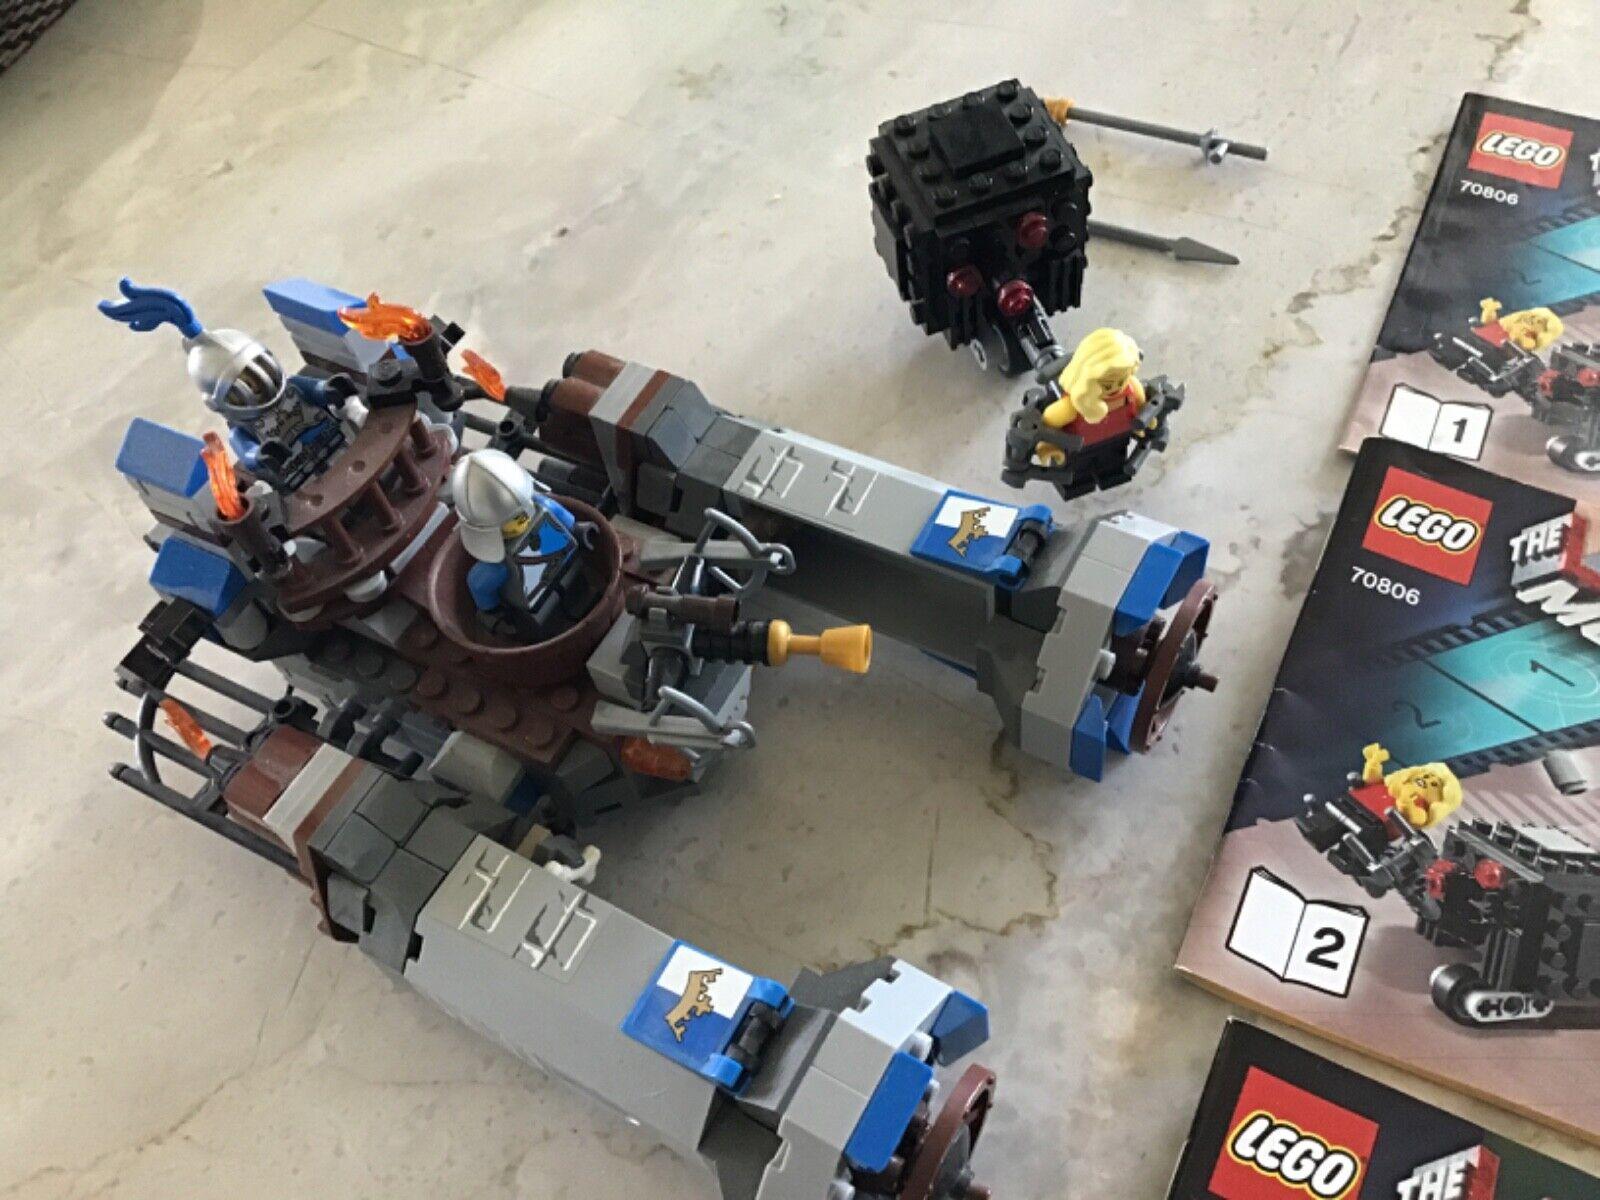 Lego The Lego Movie Castle Cavalry 70806 Retired Building Toy Set Lego